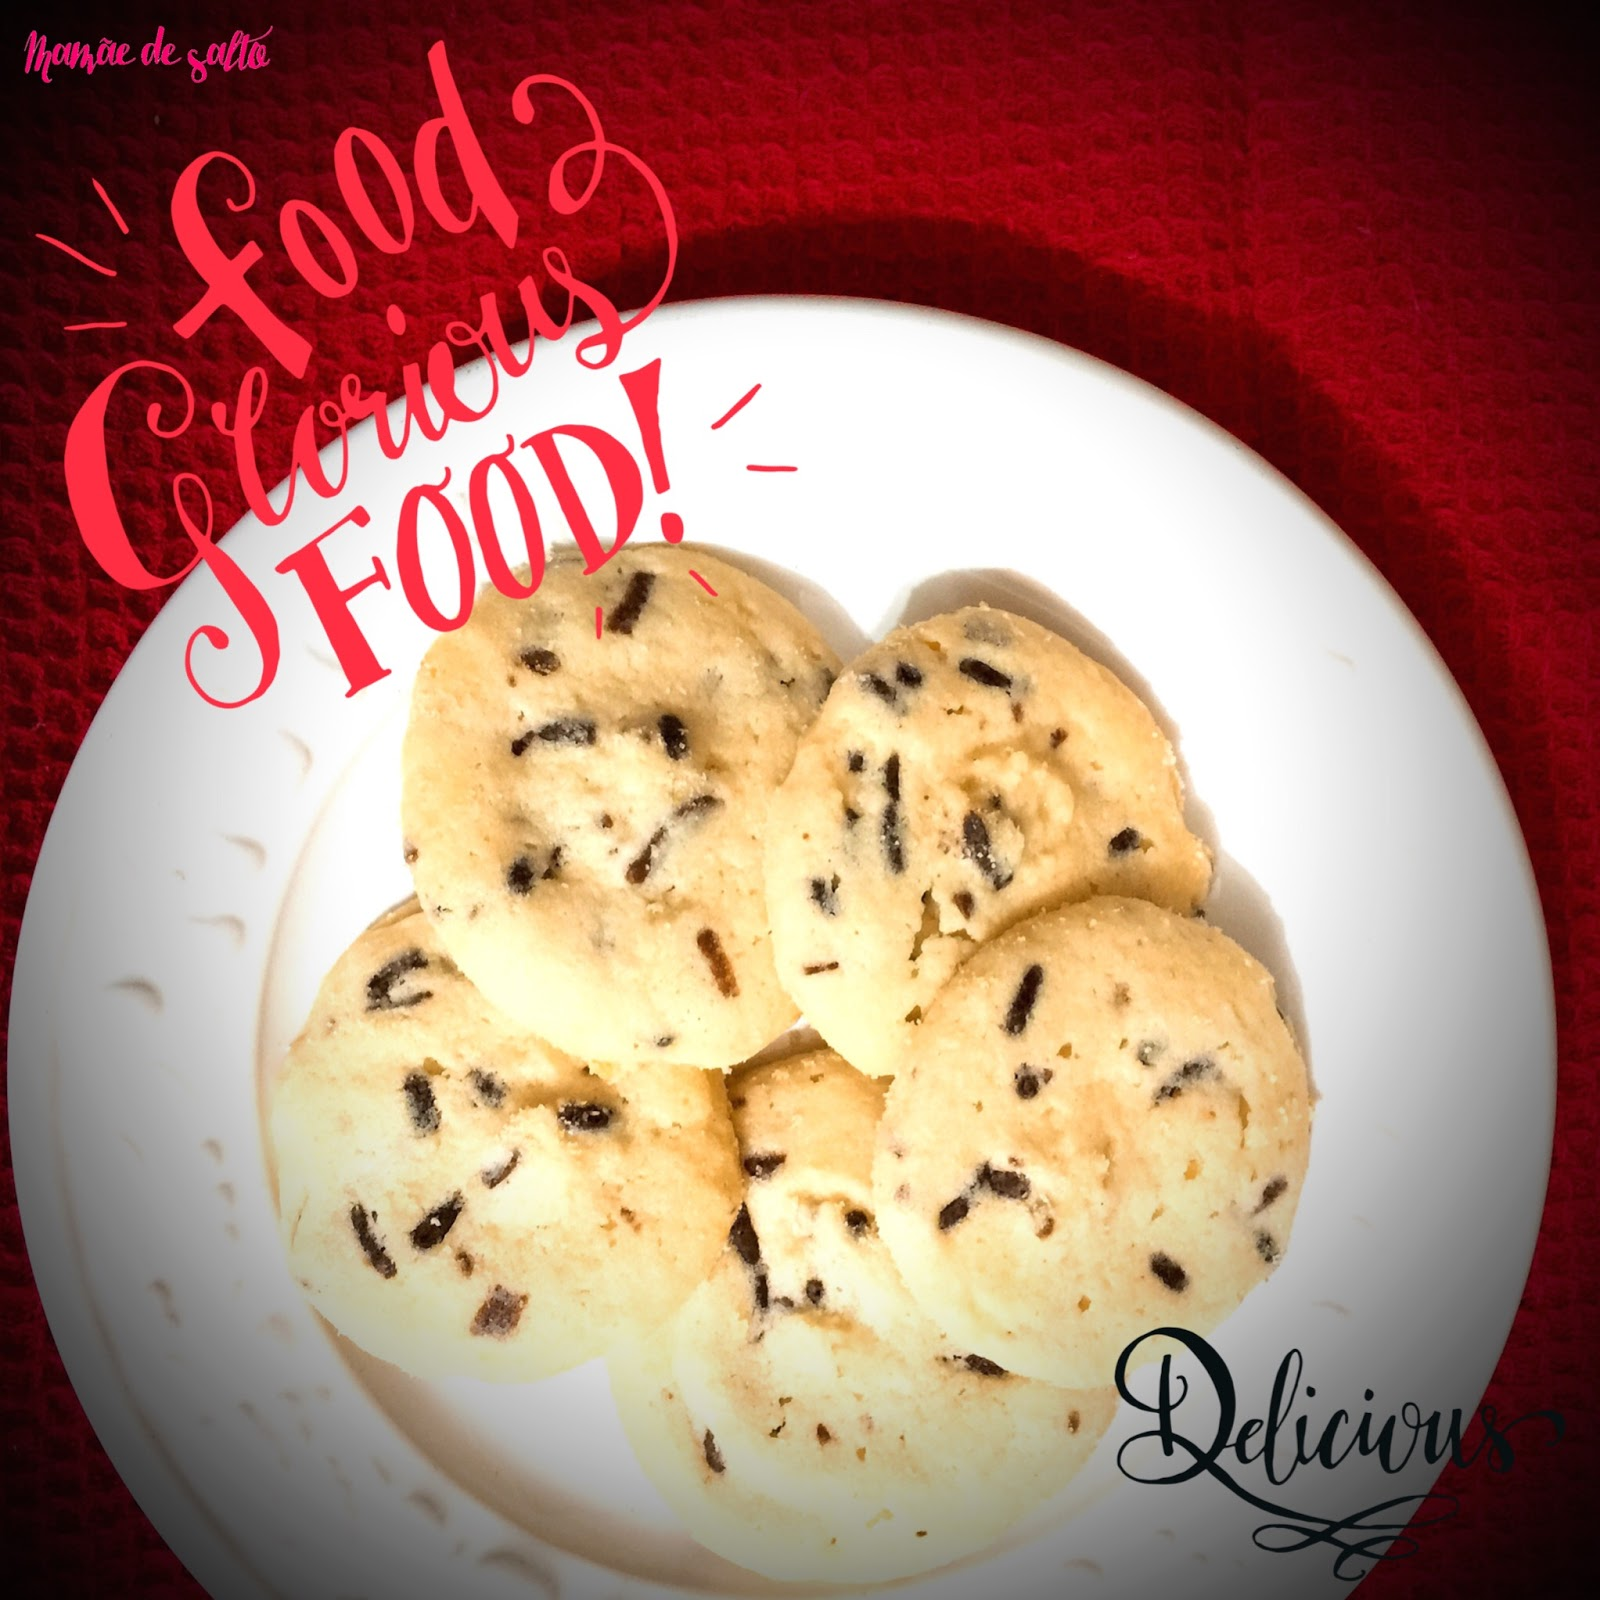 biscoito laranja com chocolate bolachas holandesas jonker ... blog Mamãe de Salto